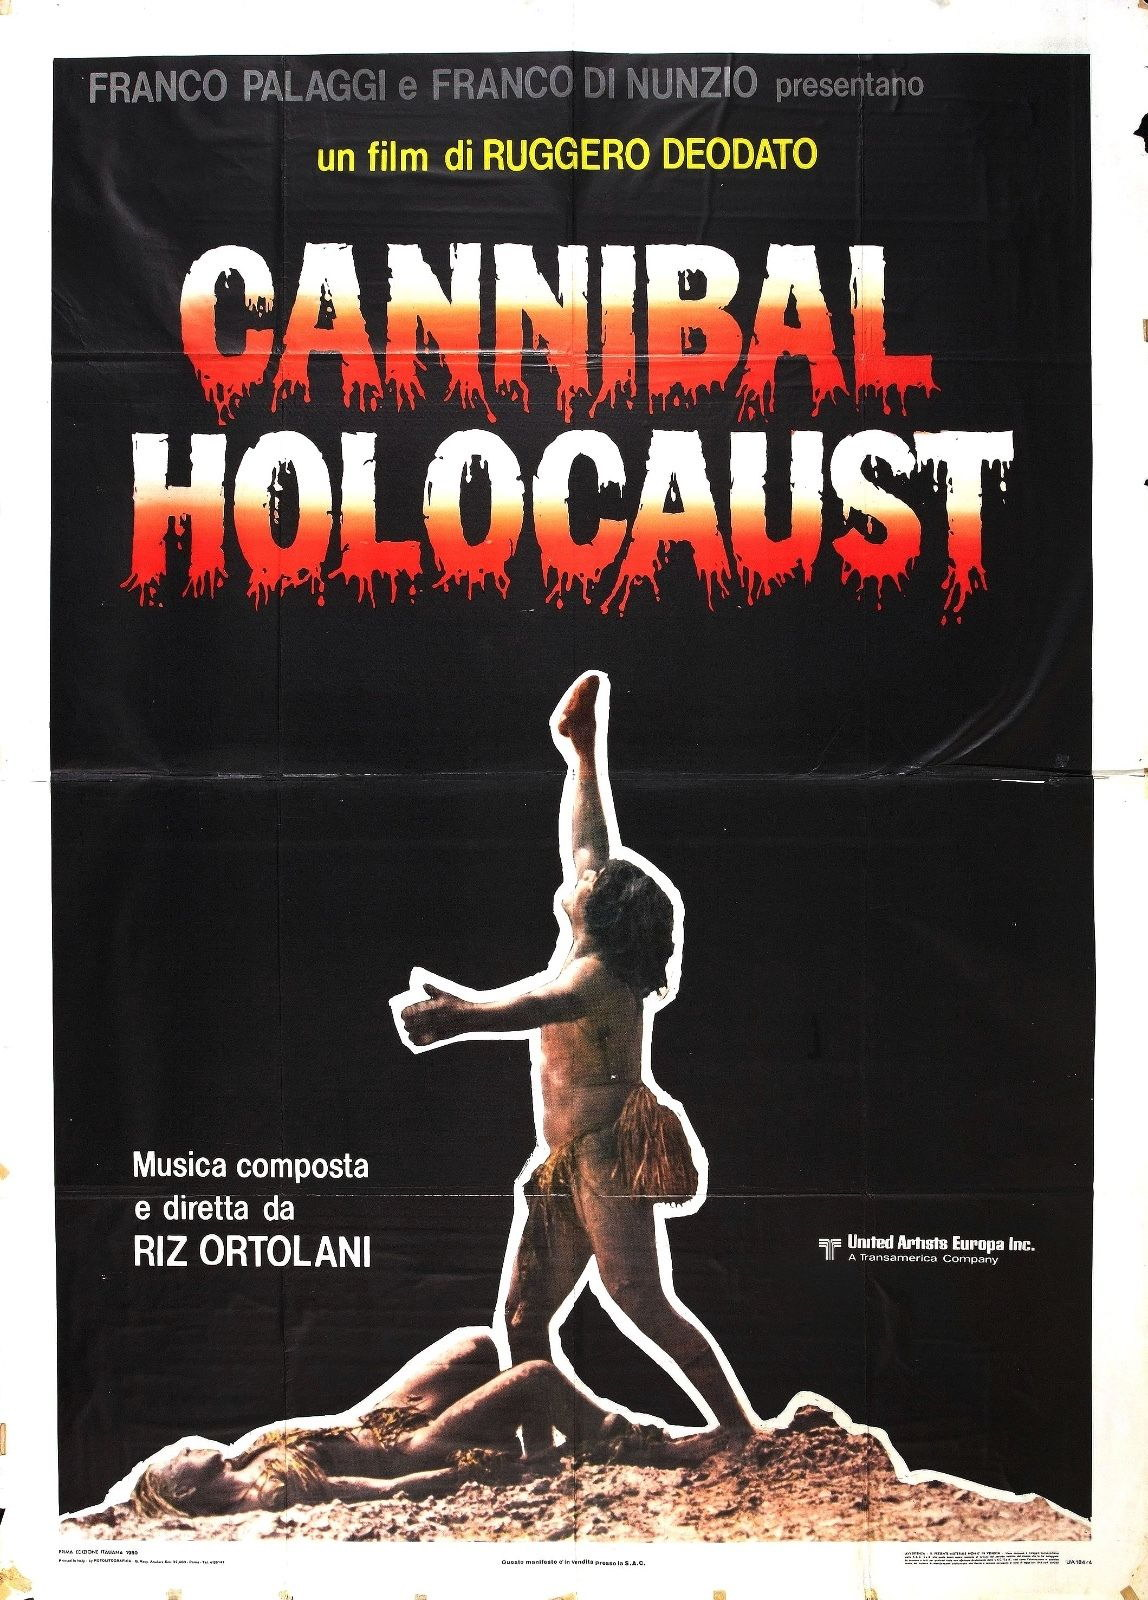 73996-Cannibal-Holocaust-Movie-1980-Horror-FRAMED-CANVAS-PRINT-Toile